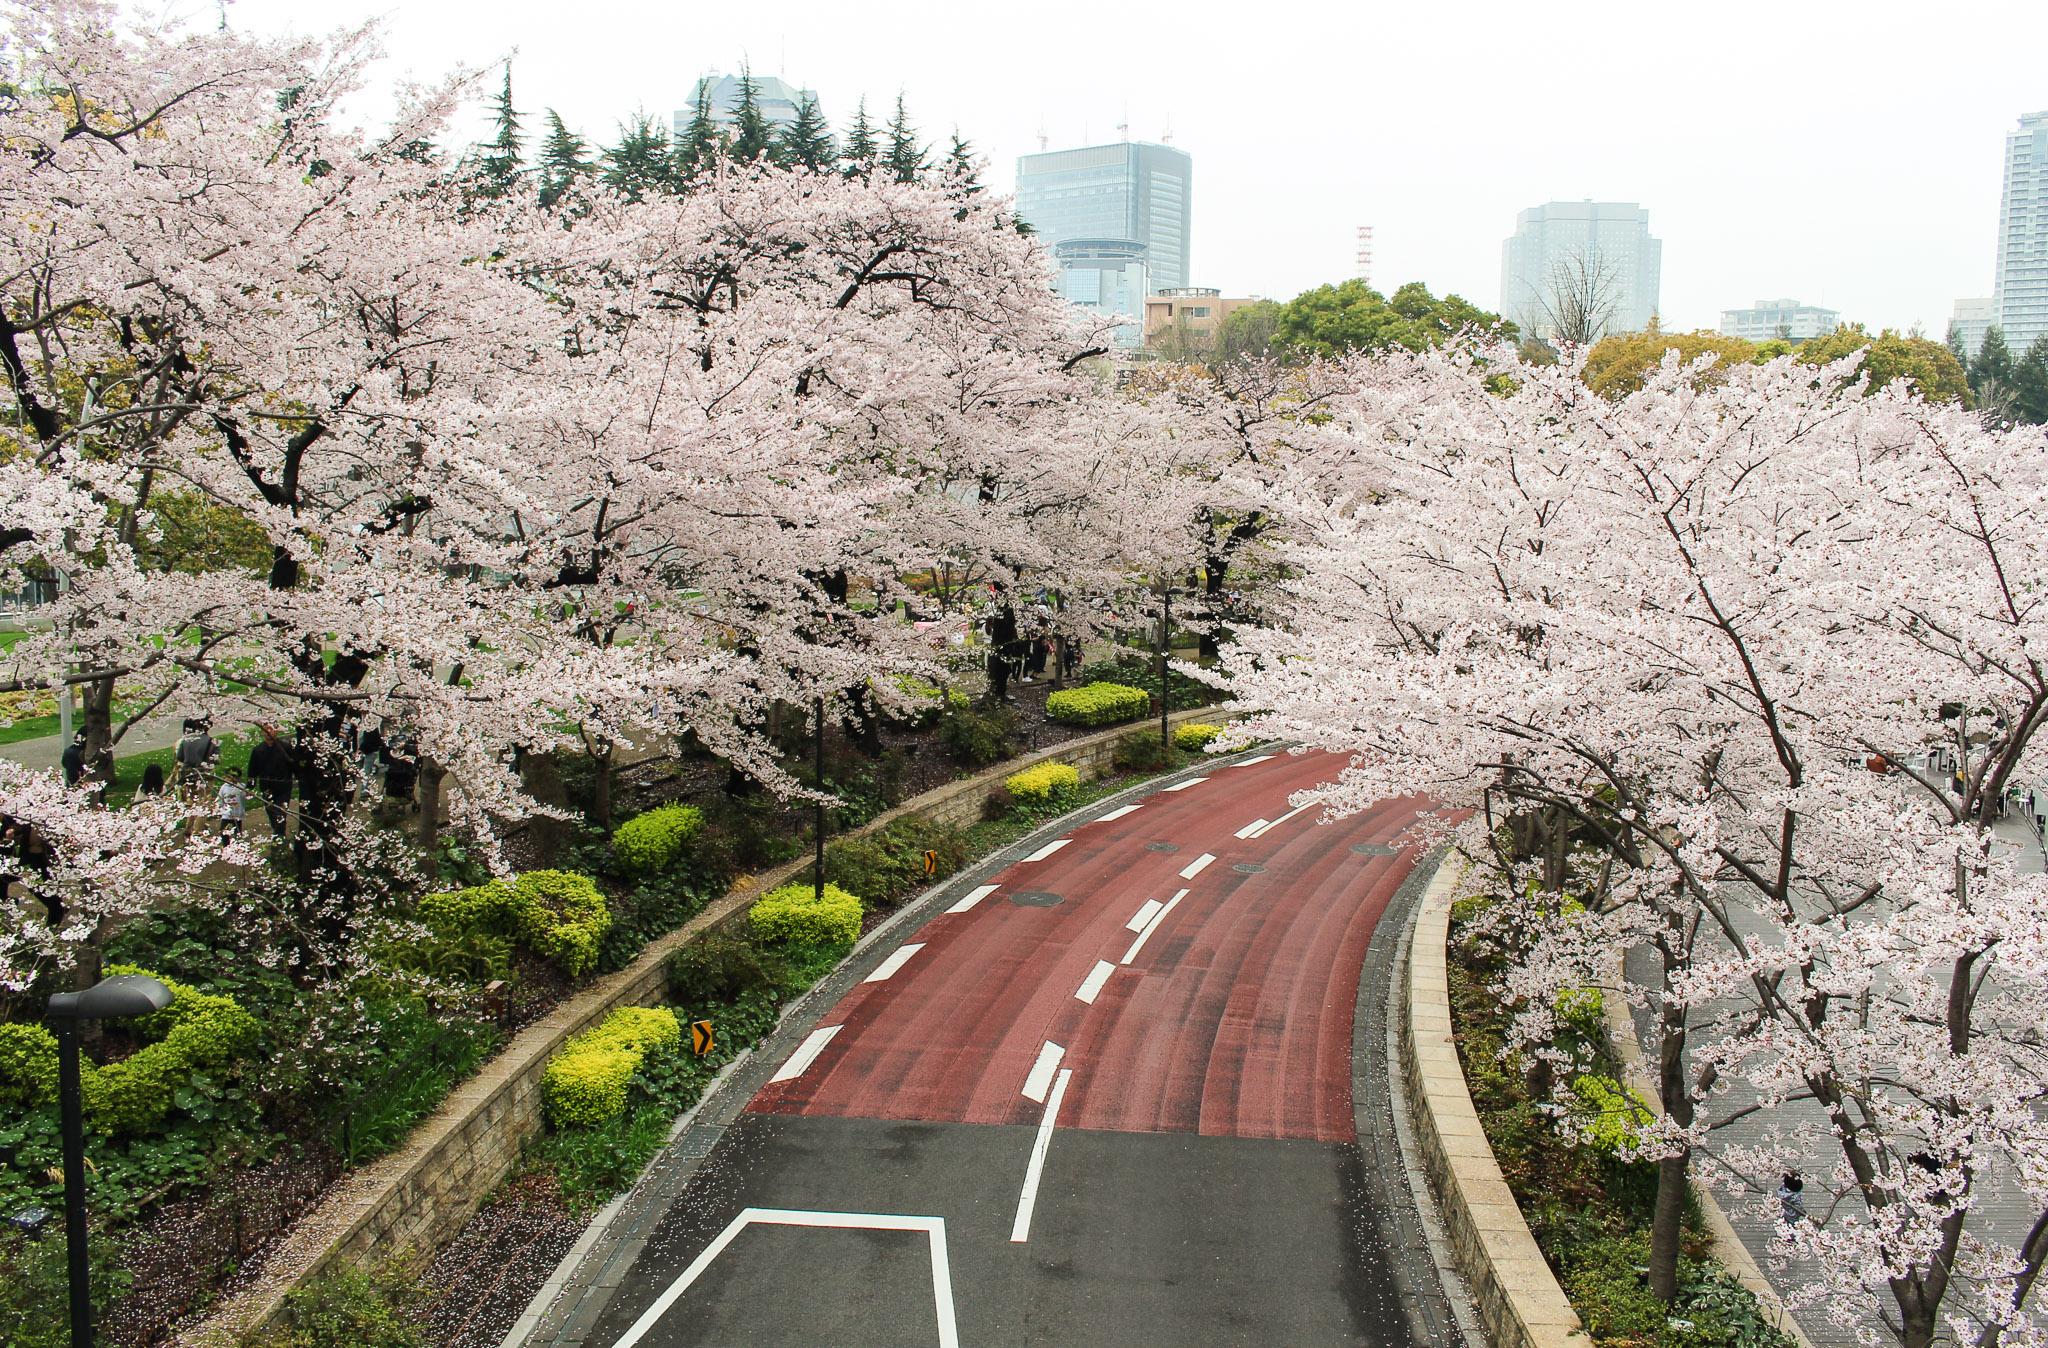 It's cherry blossom season.